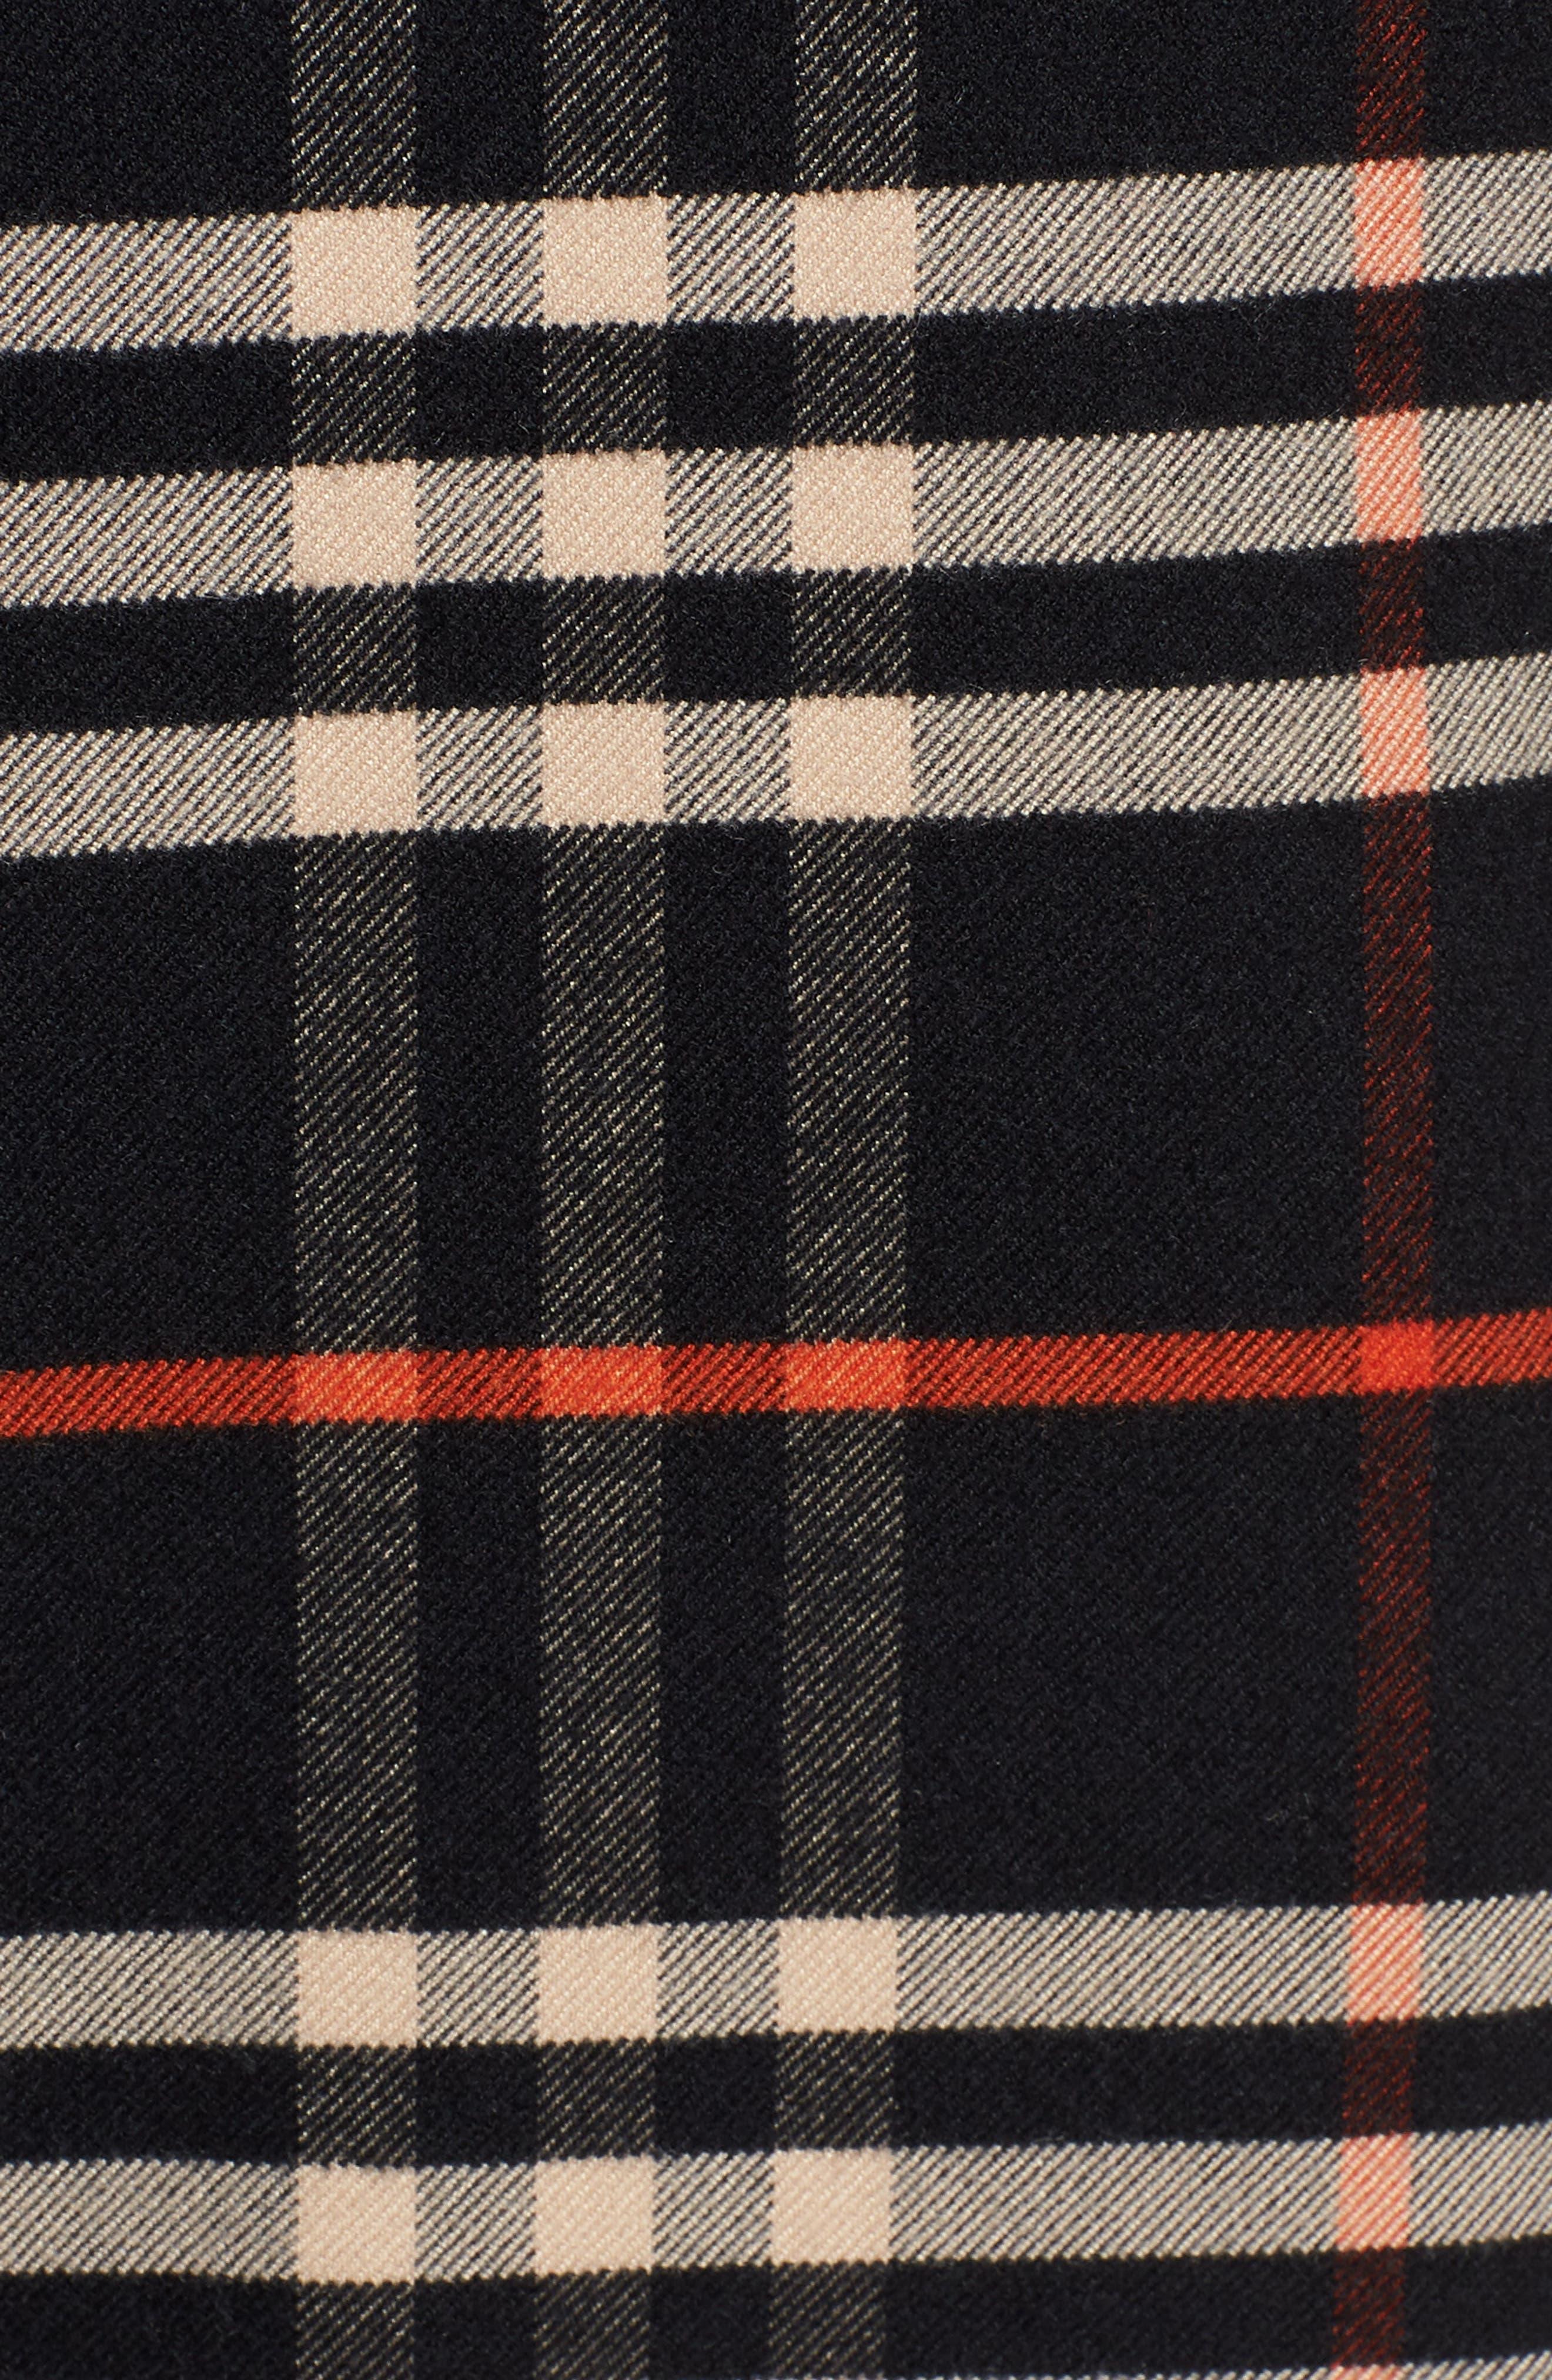 Check Shirtdress,                             Alternate thumbnail 6, color,                             001